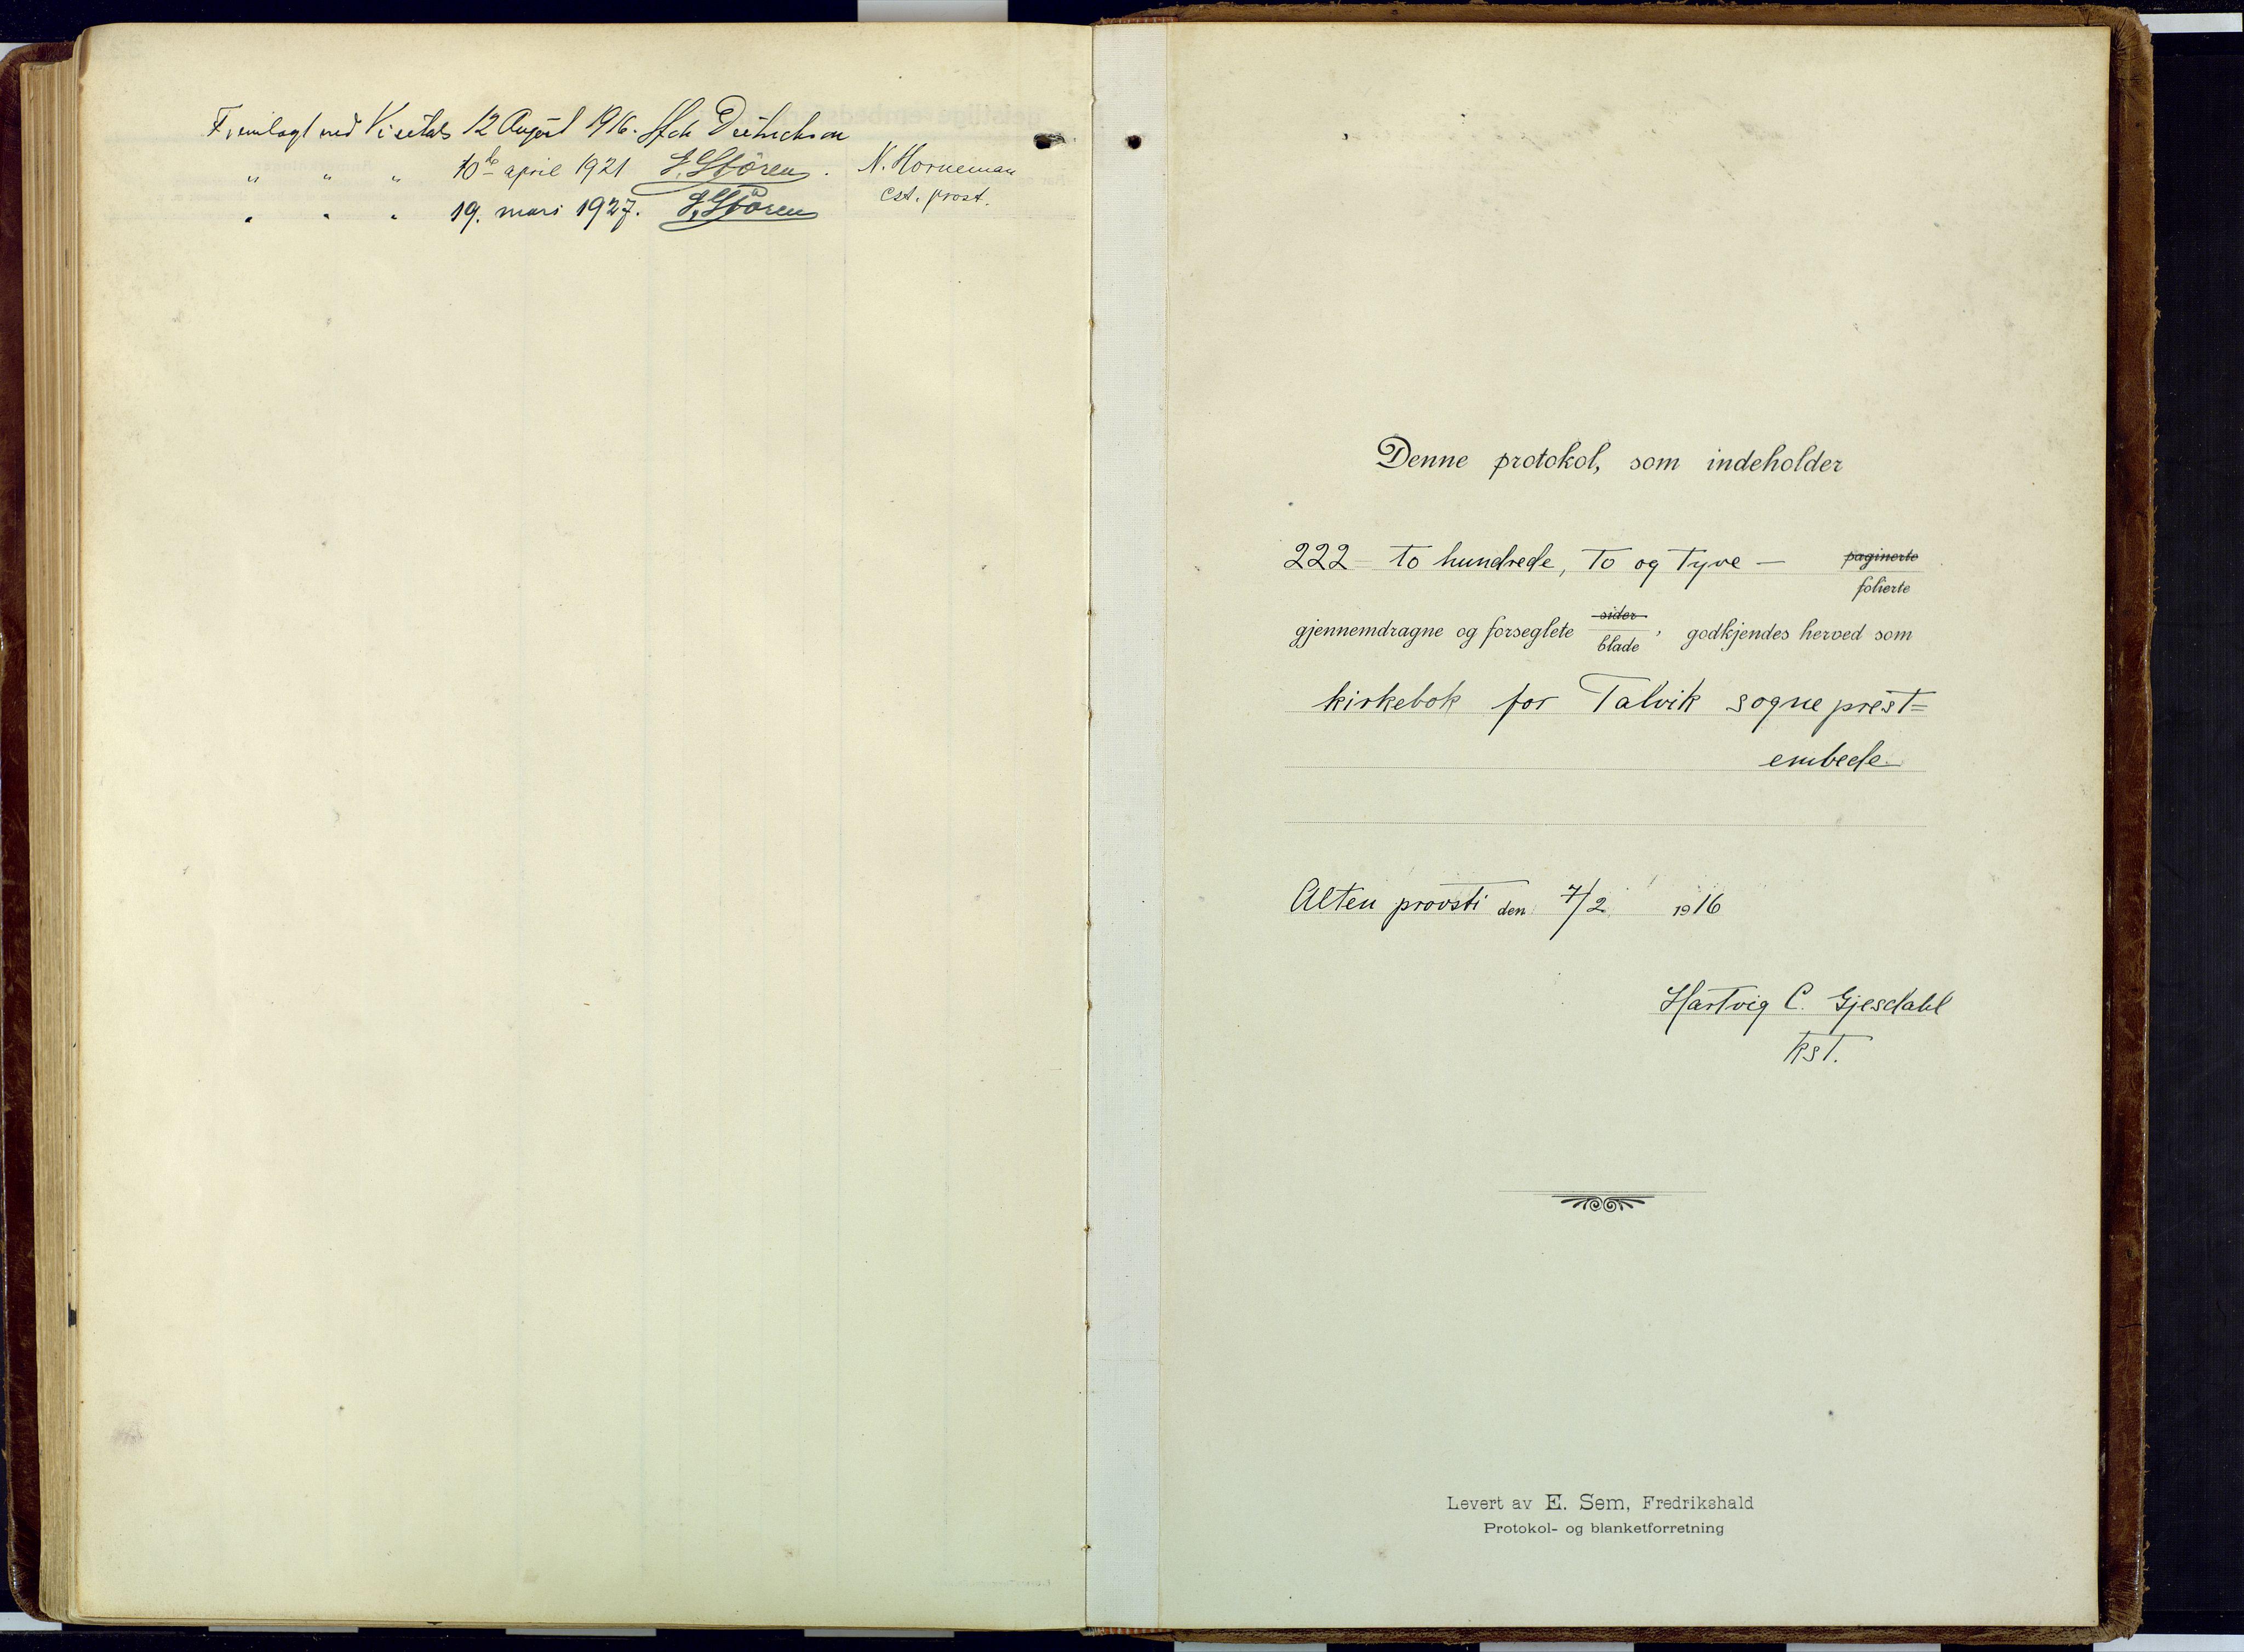 SATØ, Talvik sokneprestkontor, H/Ha/L0018kirke: Ministerialbok nr. 18, 1915-1924